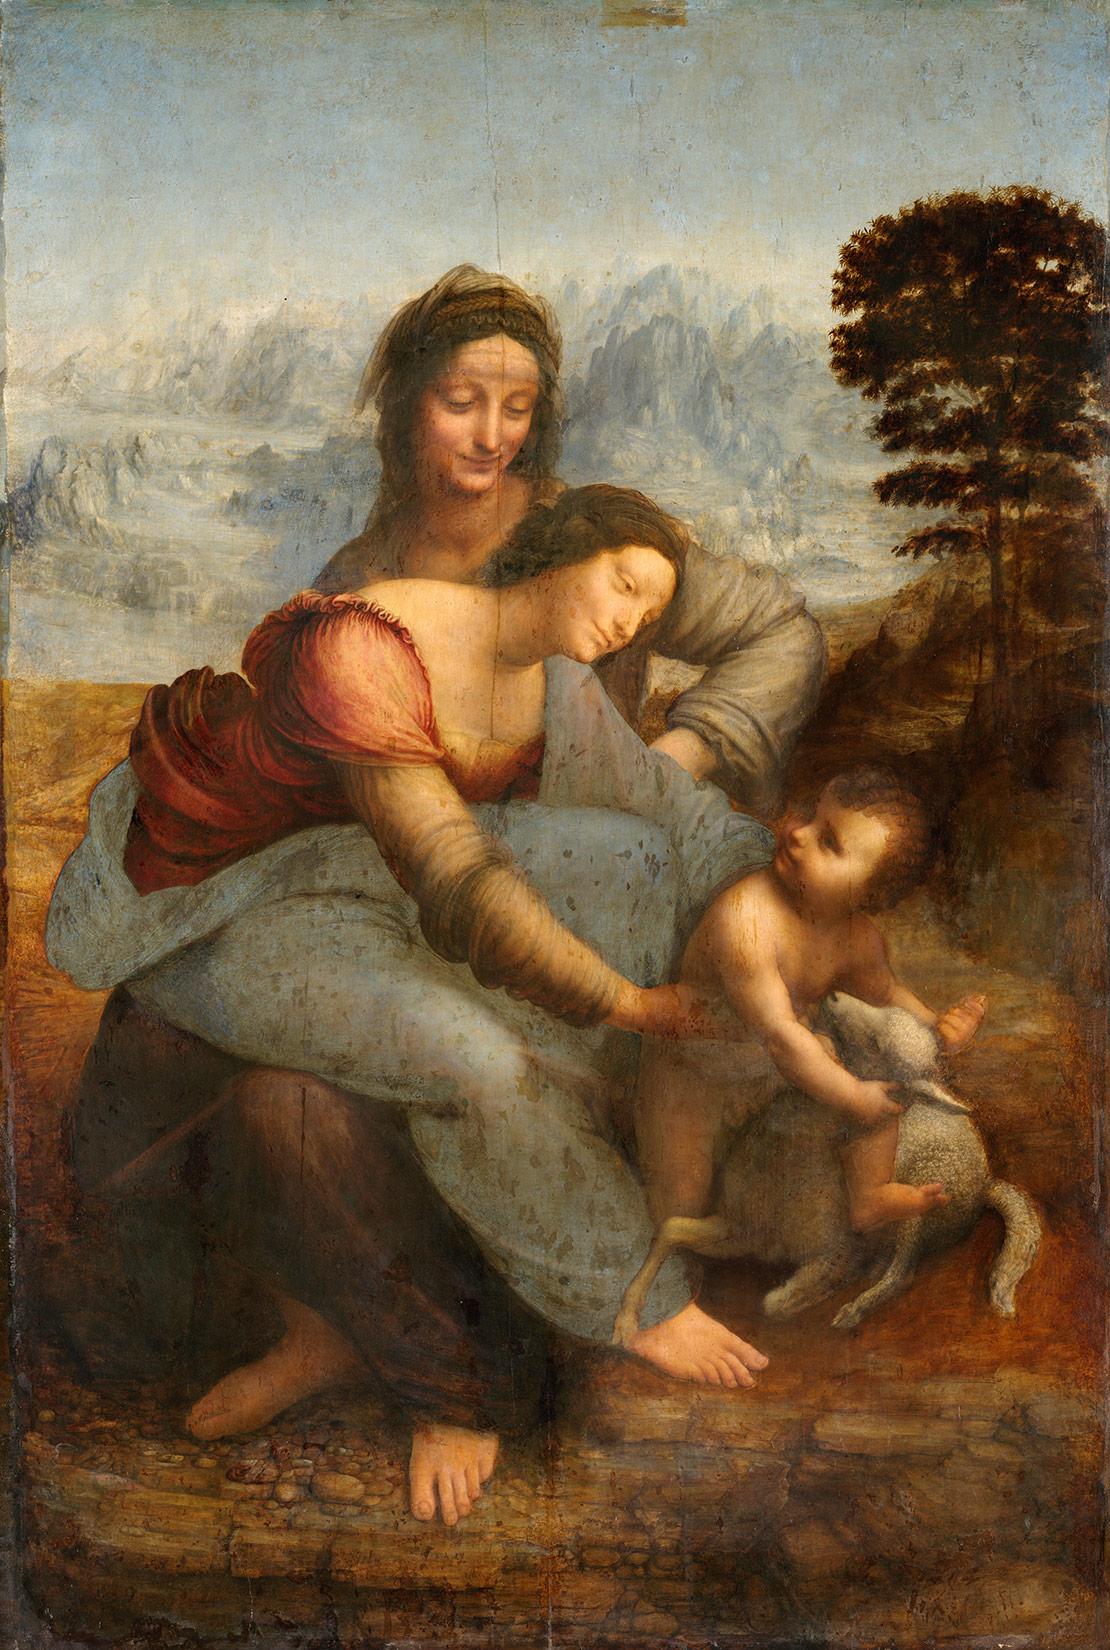 Анна, Мария и младенец Христос. Леонардо да Винчи, 1503